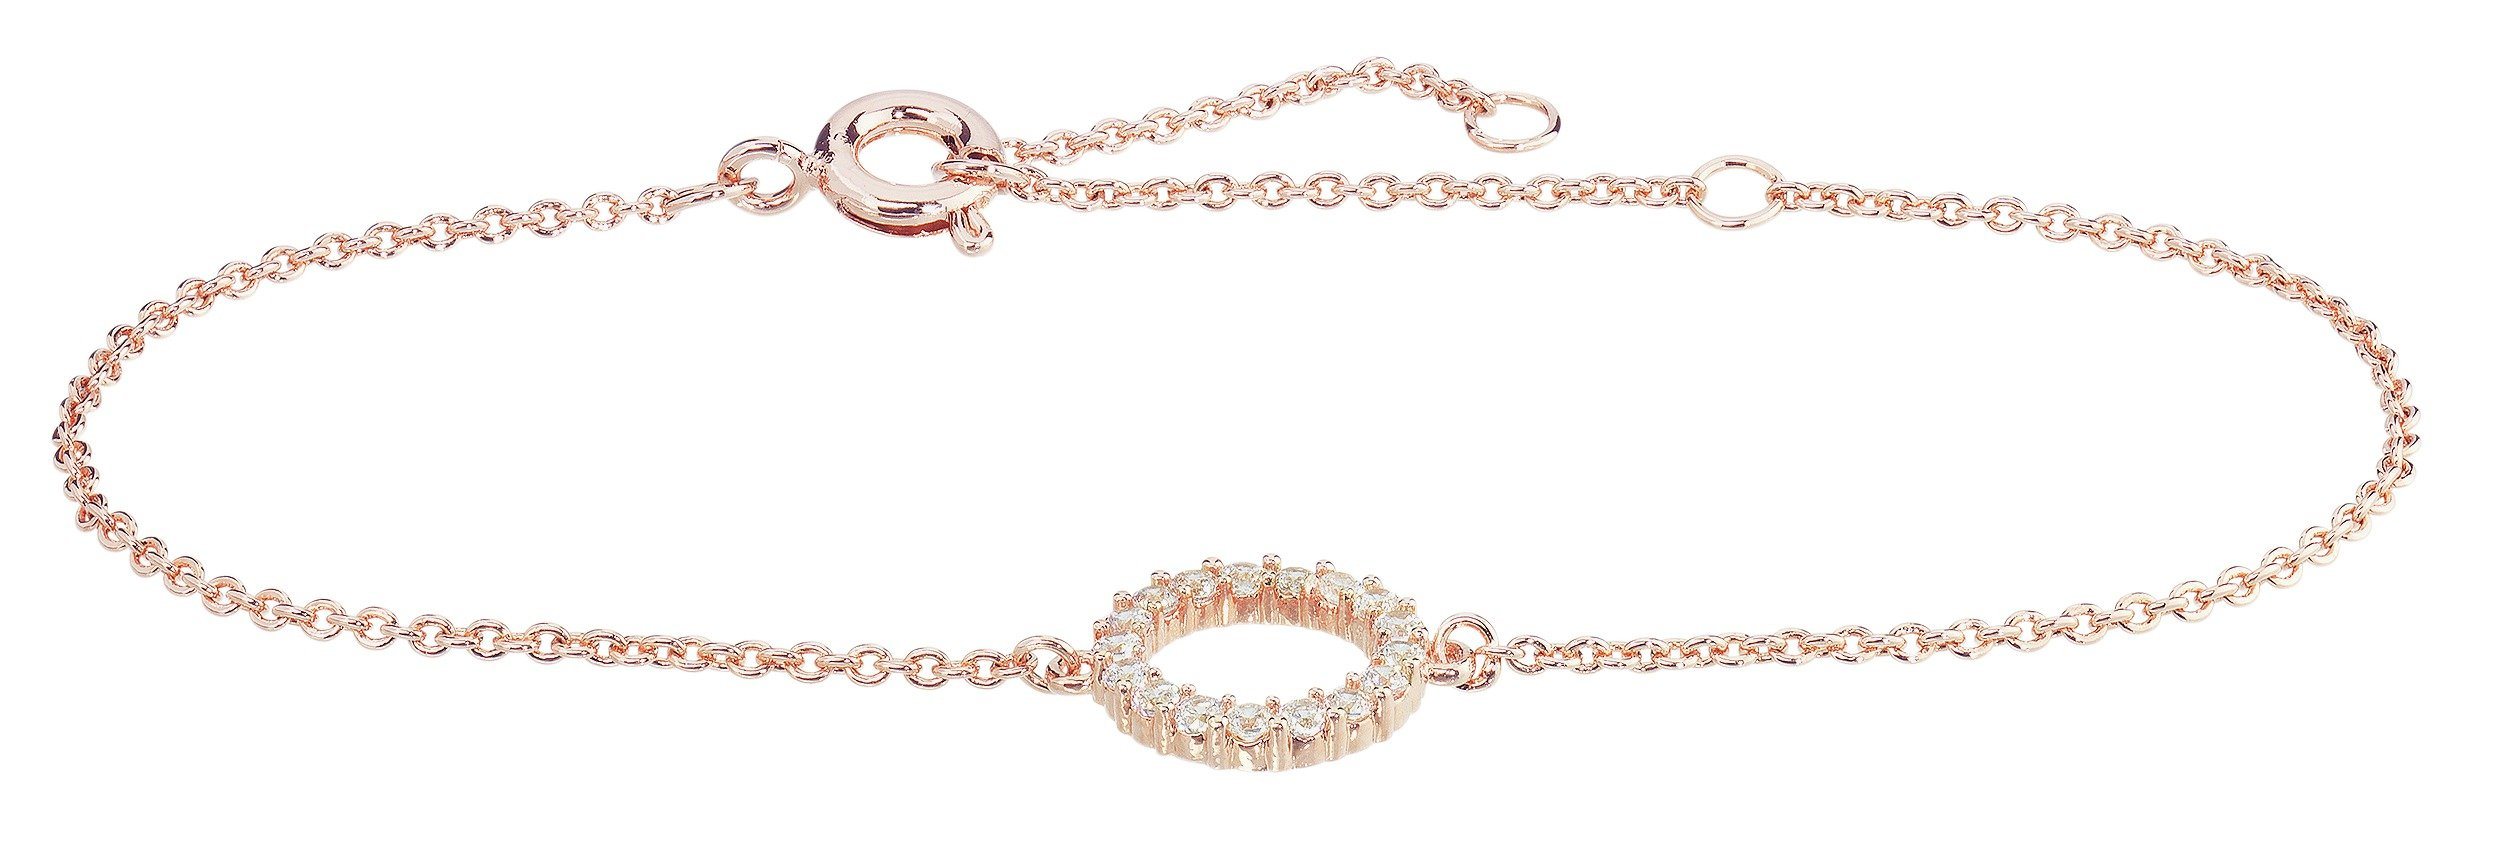 Image of Abbey Clancy Rose Gold Colour Cubic Zirconia Bracelet